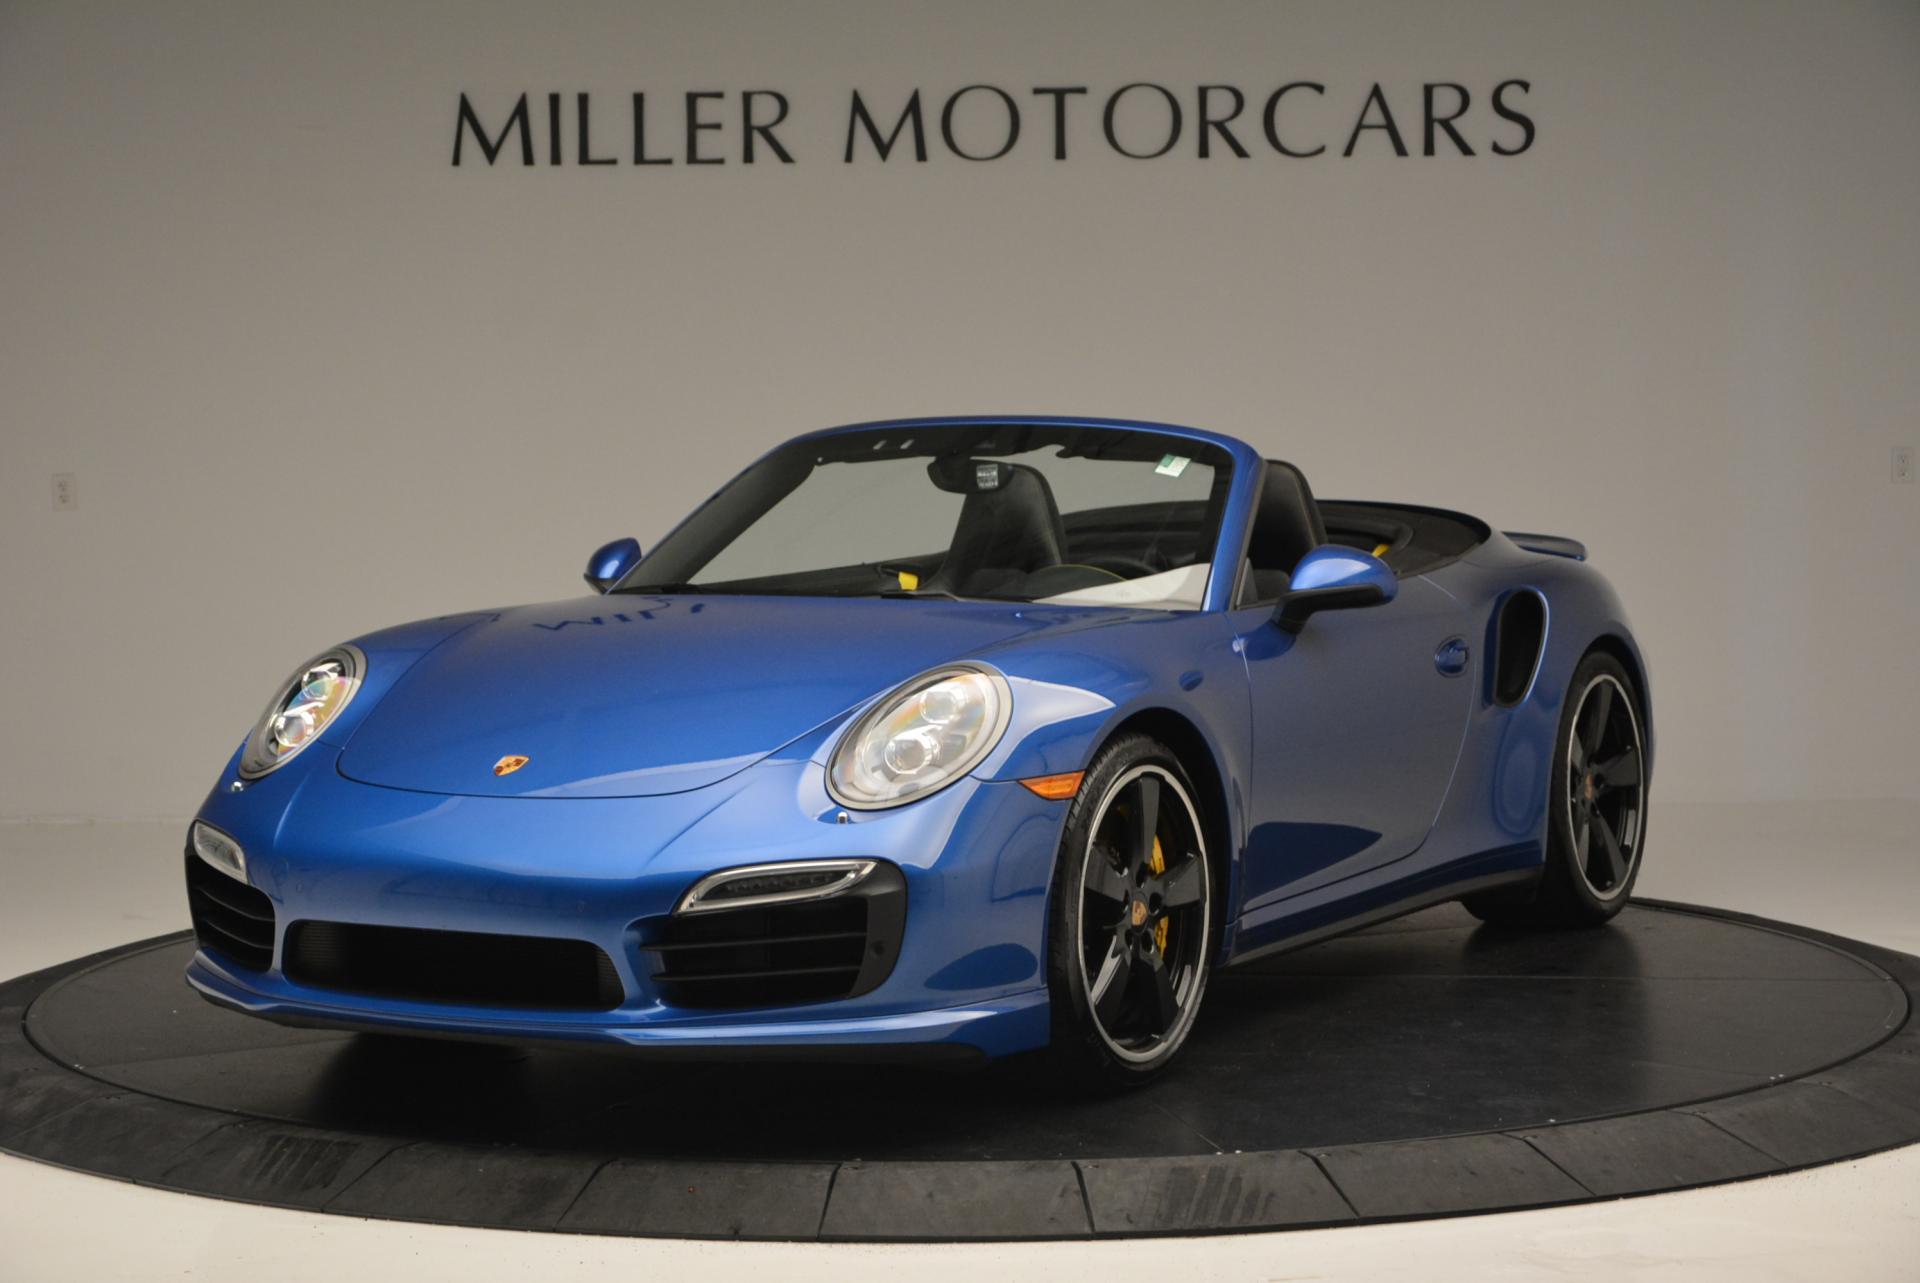 Used 2014 Porsche 911 Turbo S For Sale In Greenwich, CT 105_main